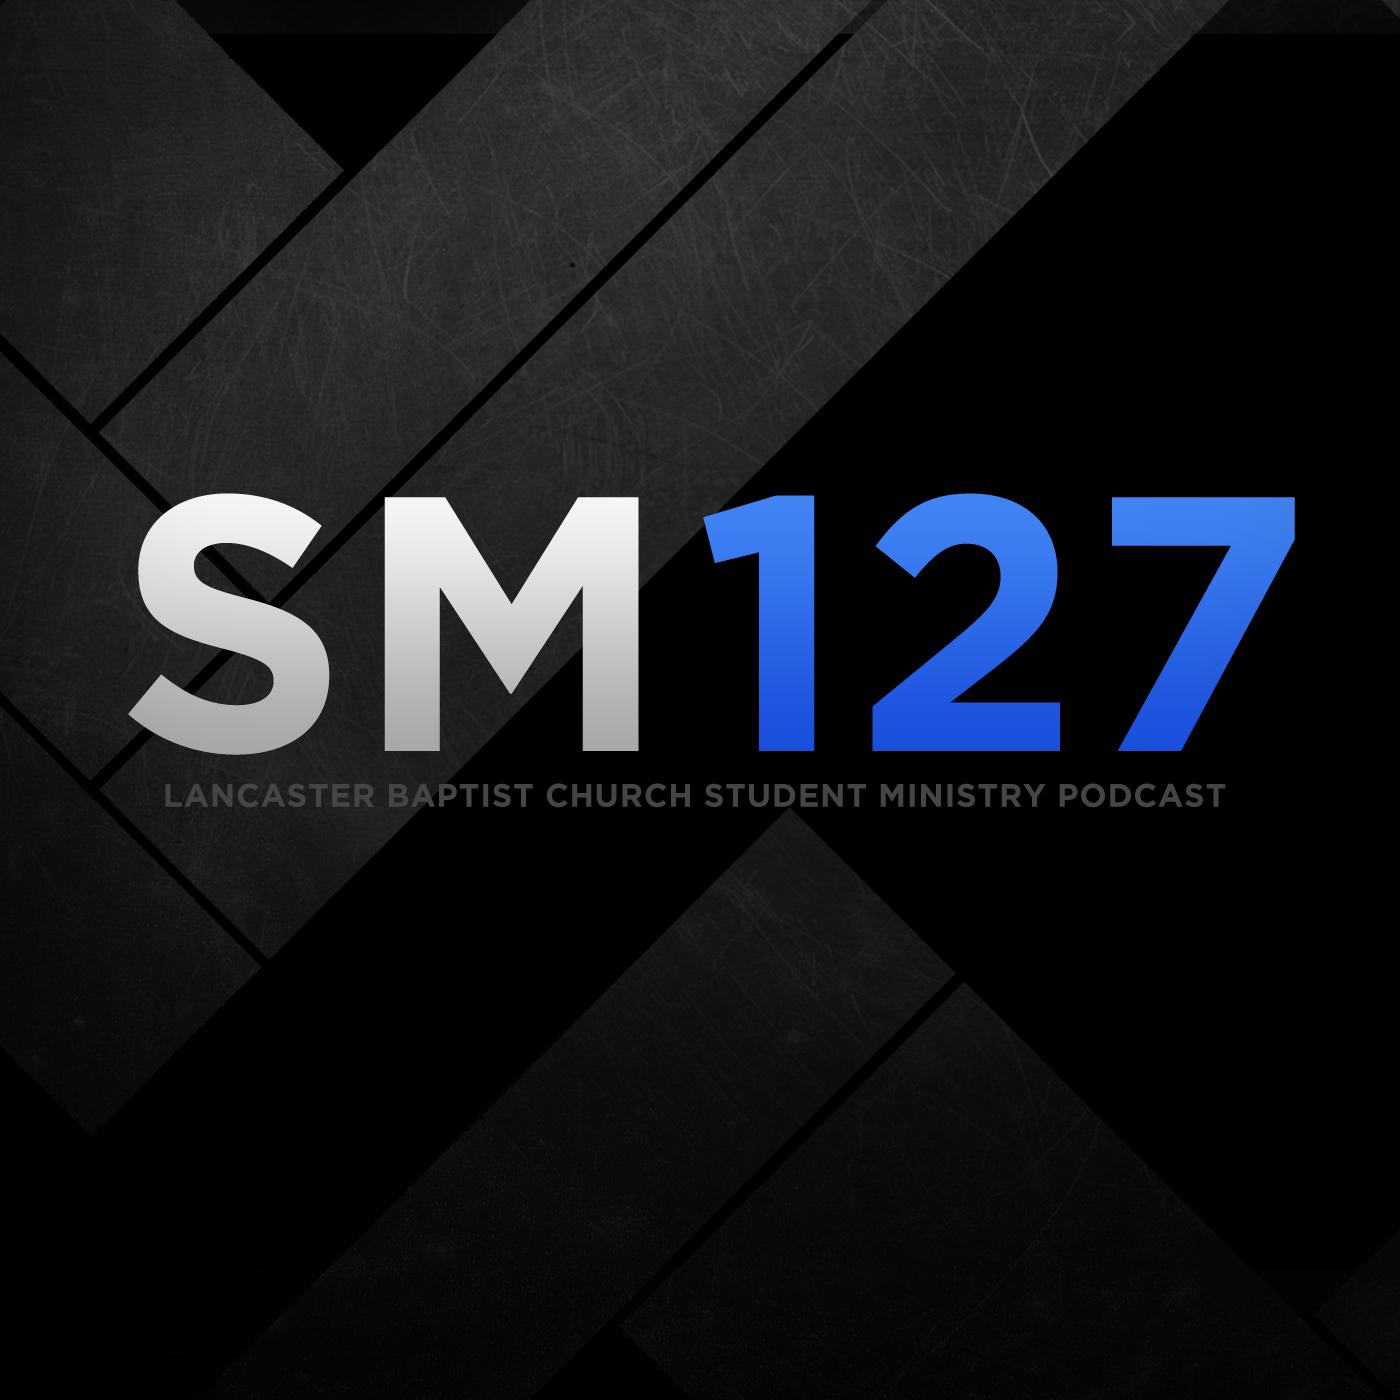 SM127